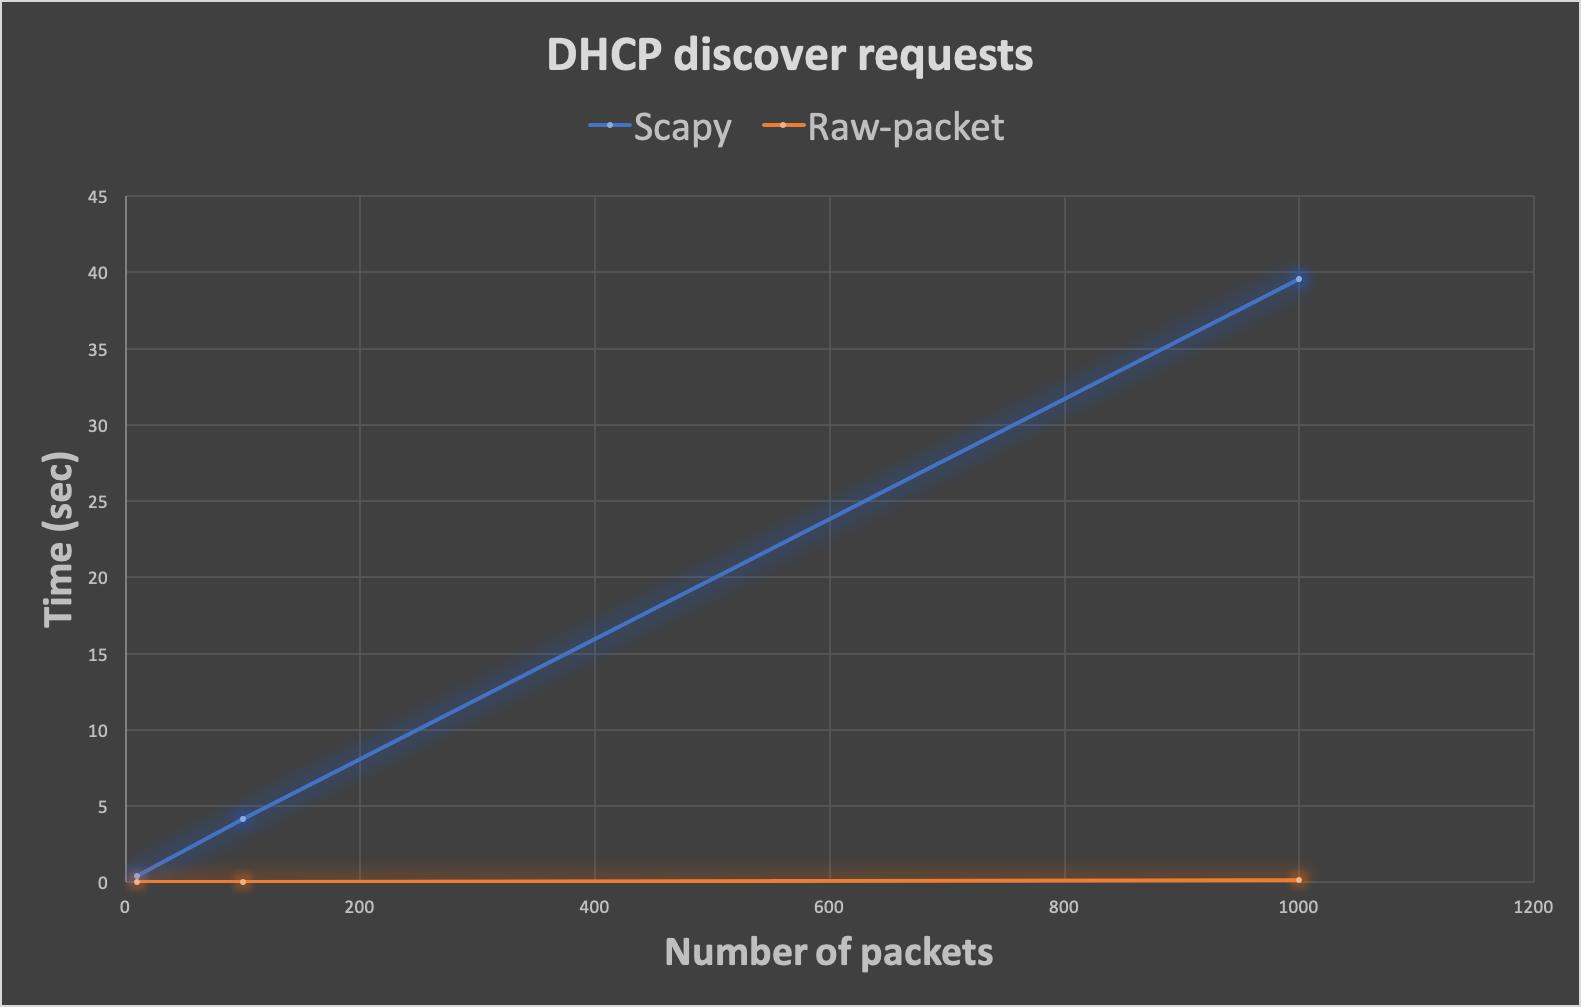 GitHub - raw-packet/raw-packet: Raw-packet Project